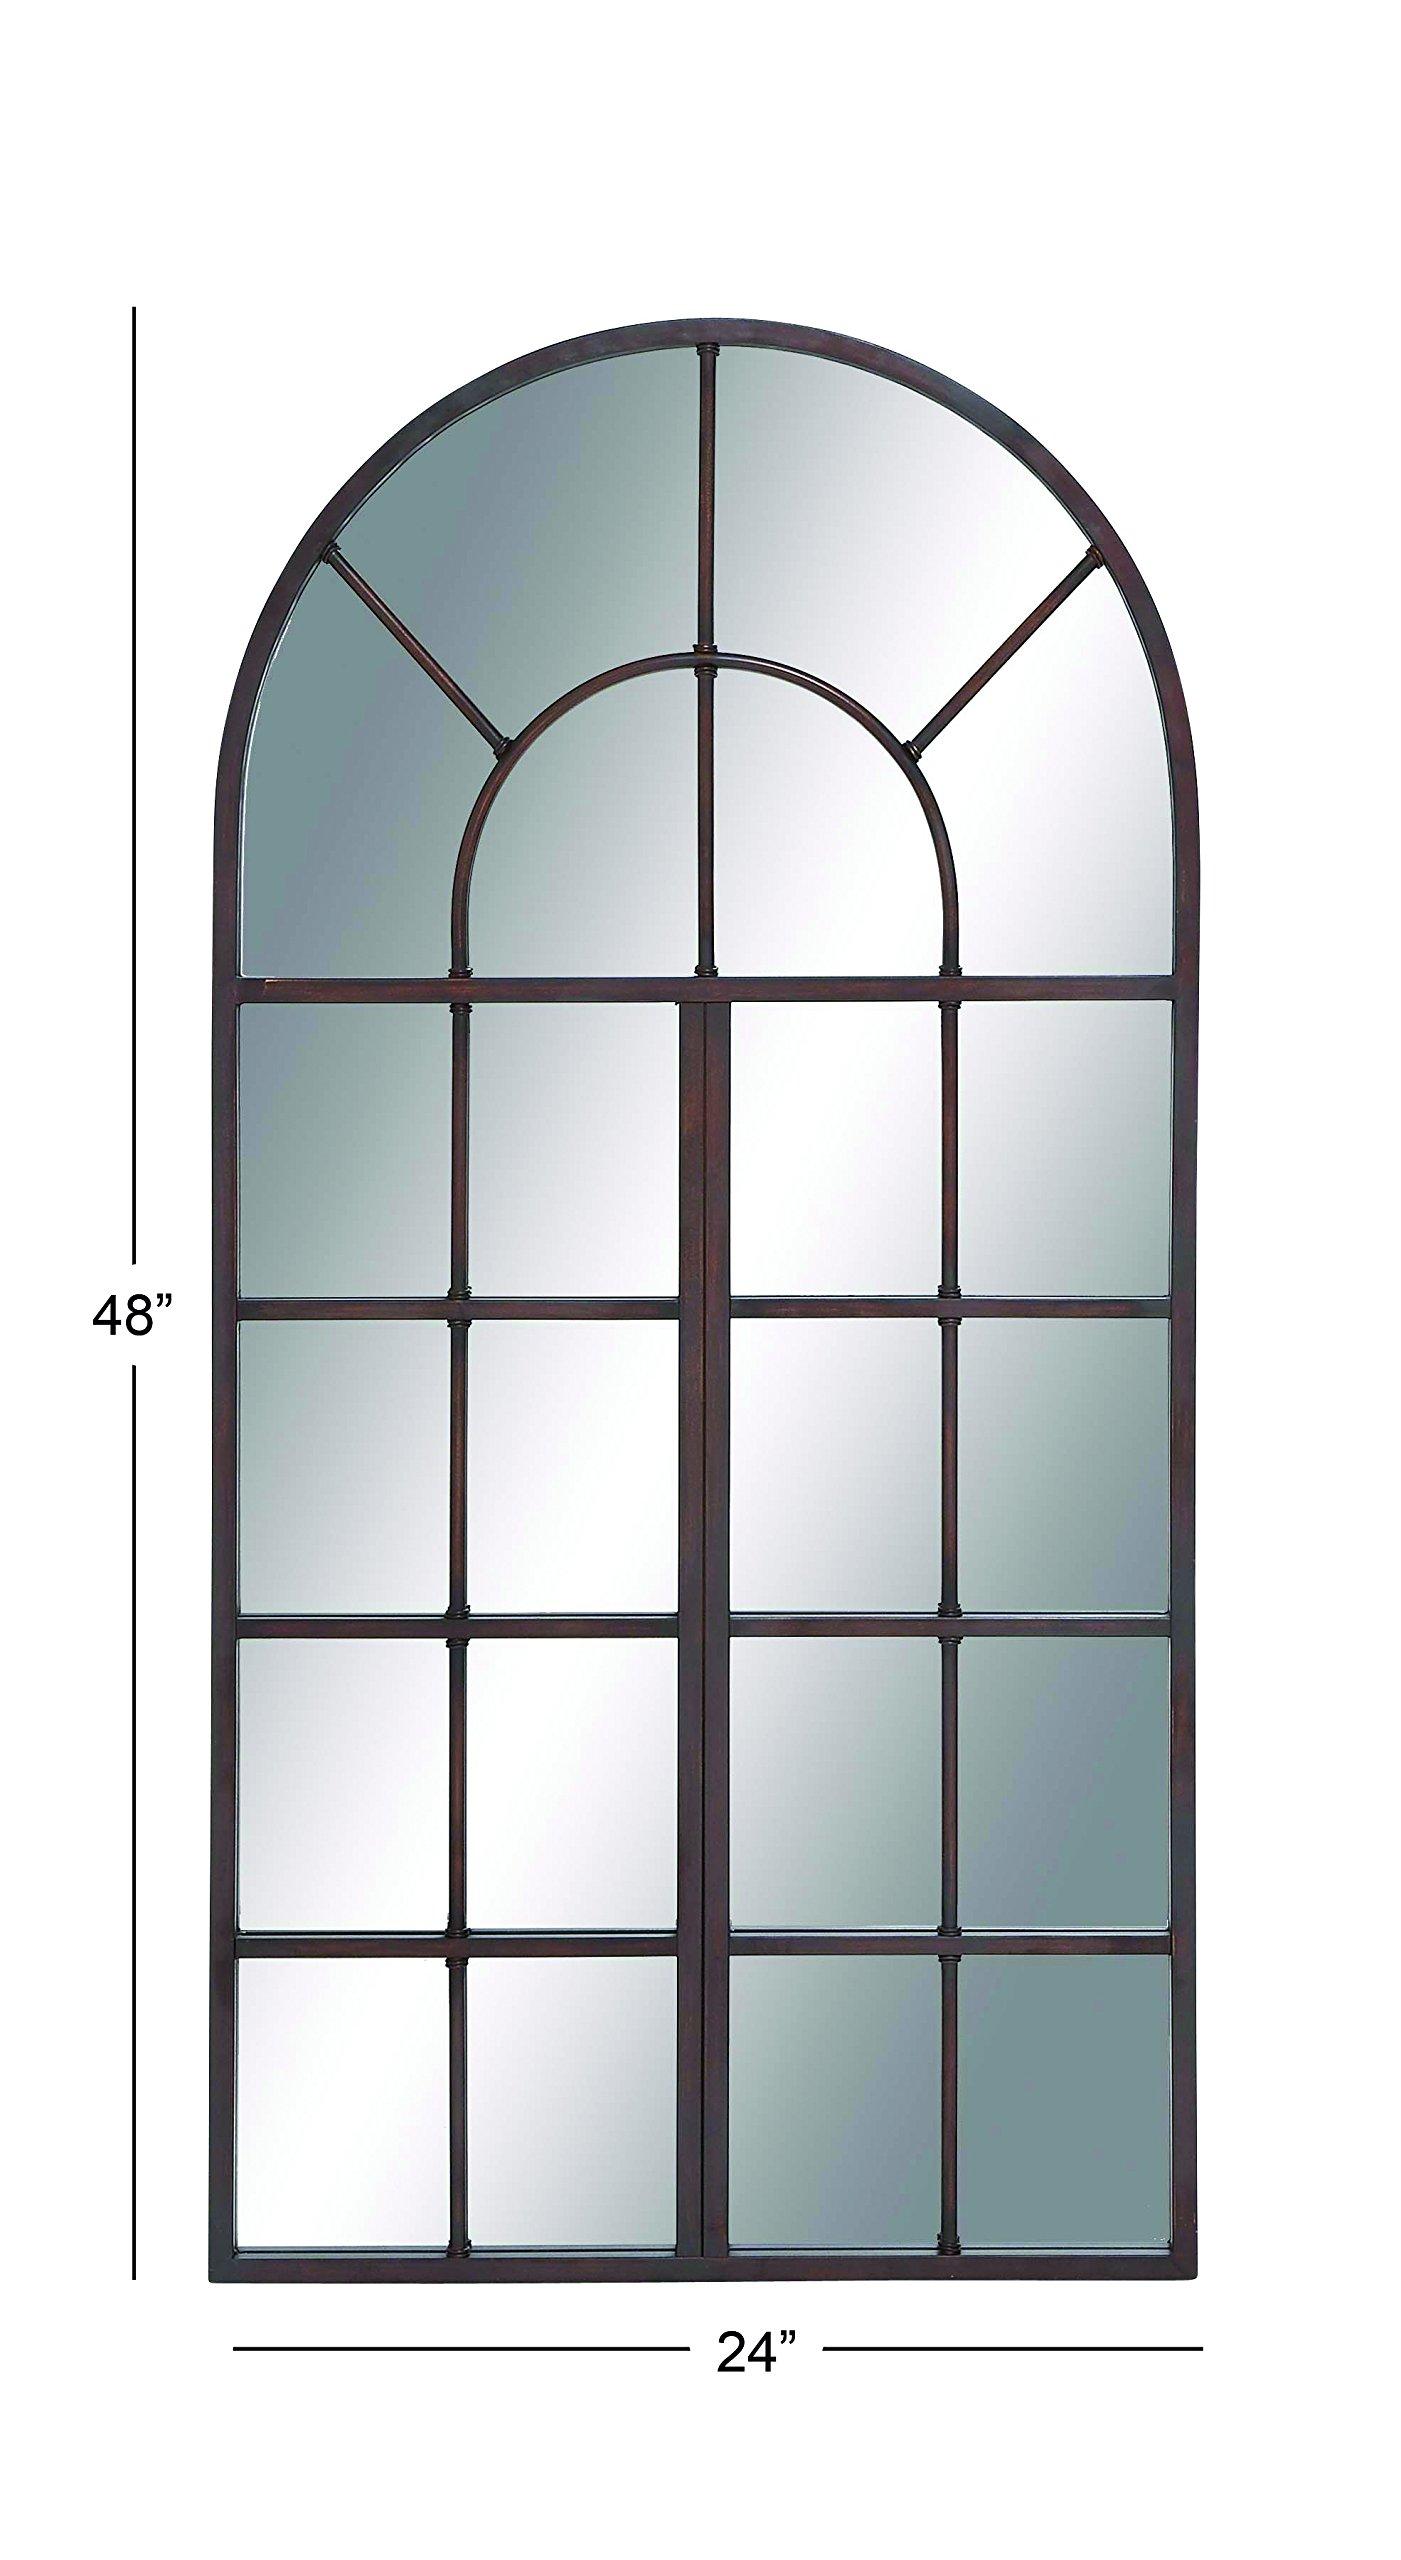 Deco 79 53224 Metal Wood Wall Mirror 24'' W, 48'' H